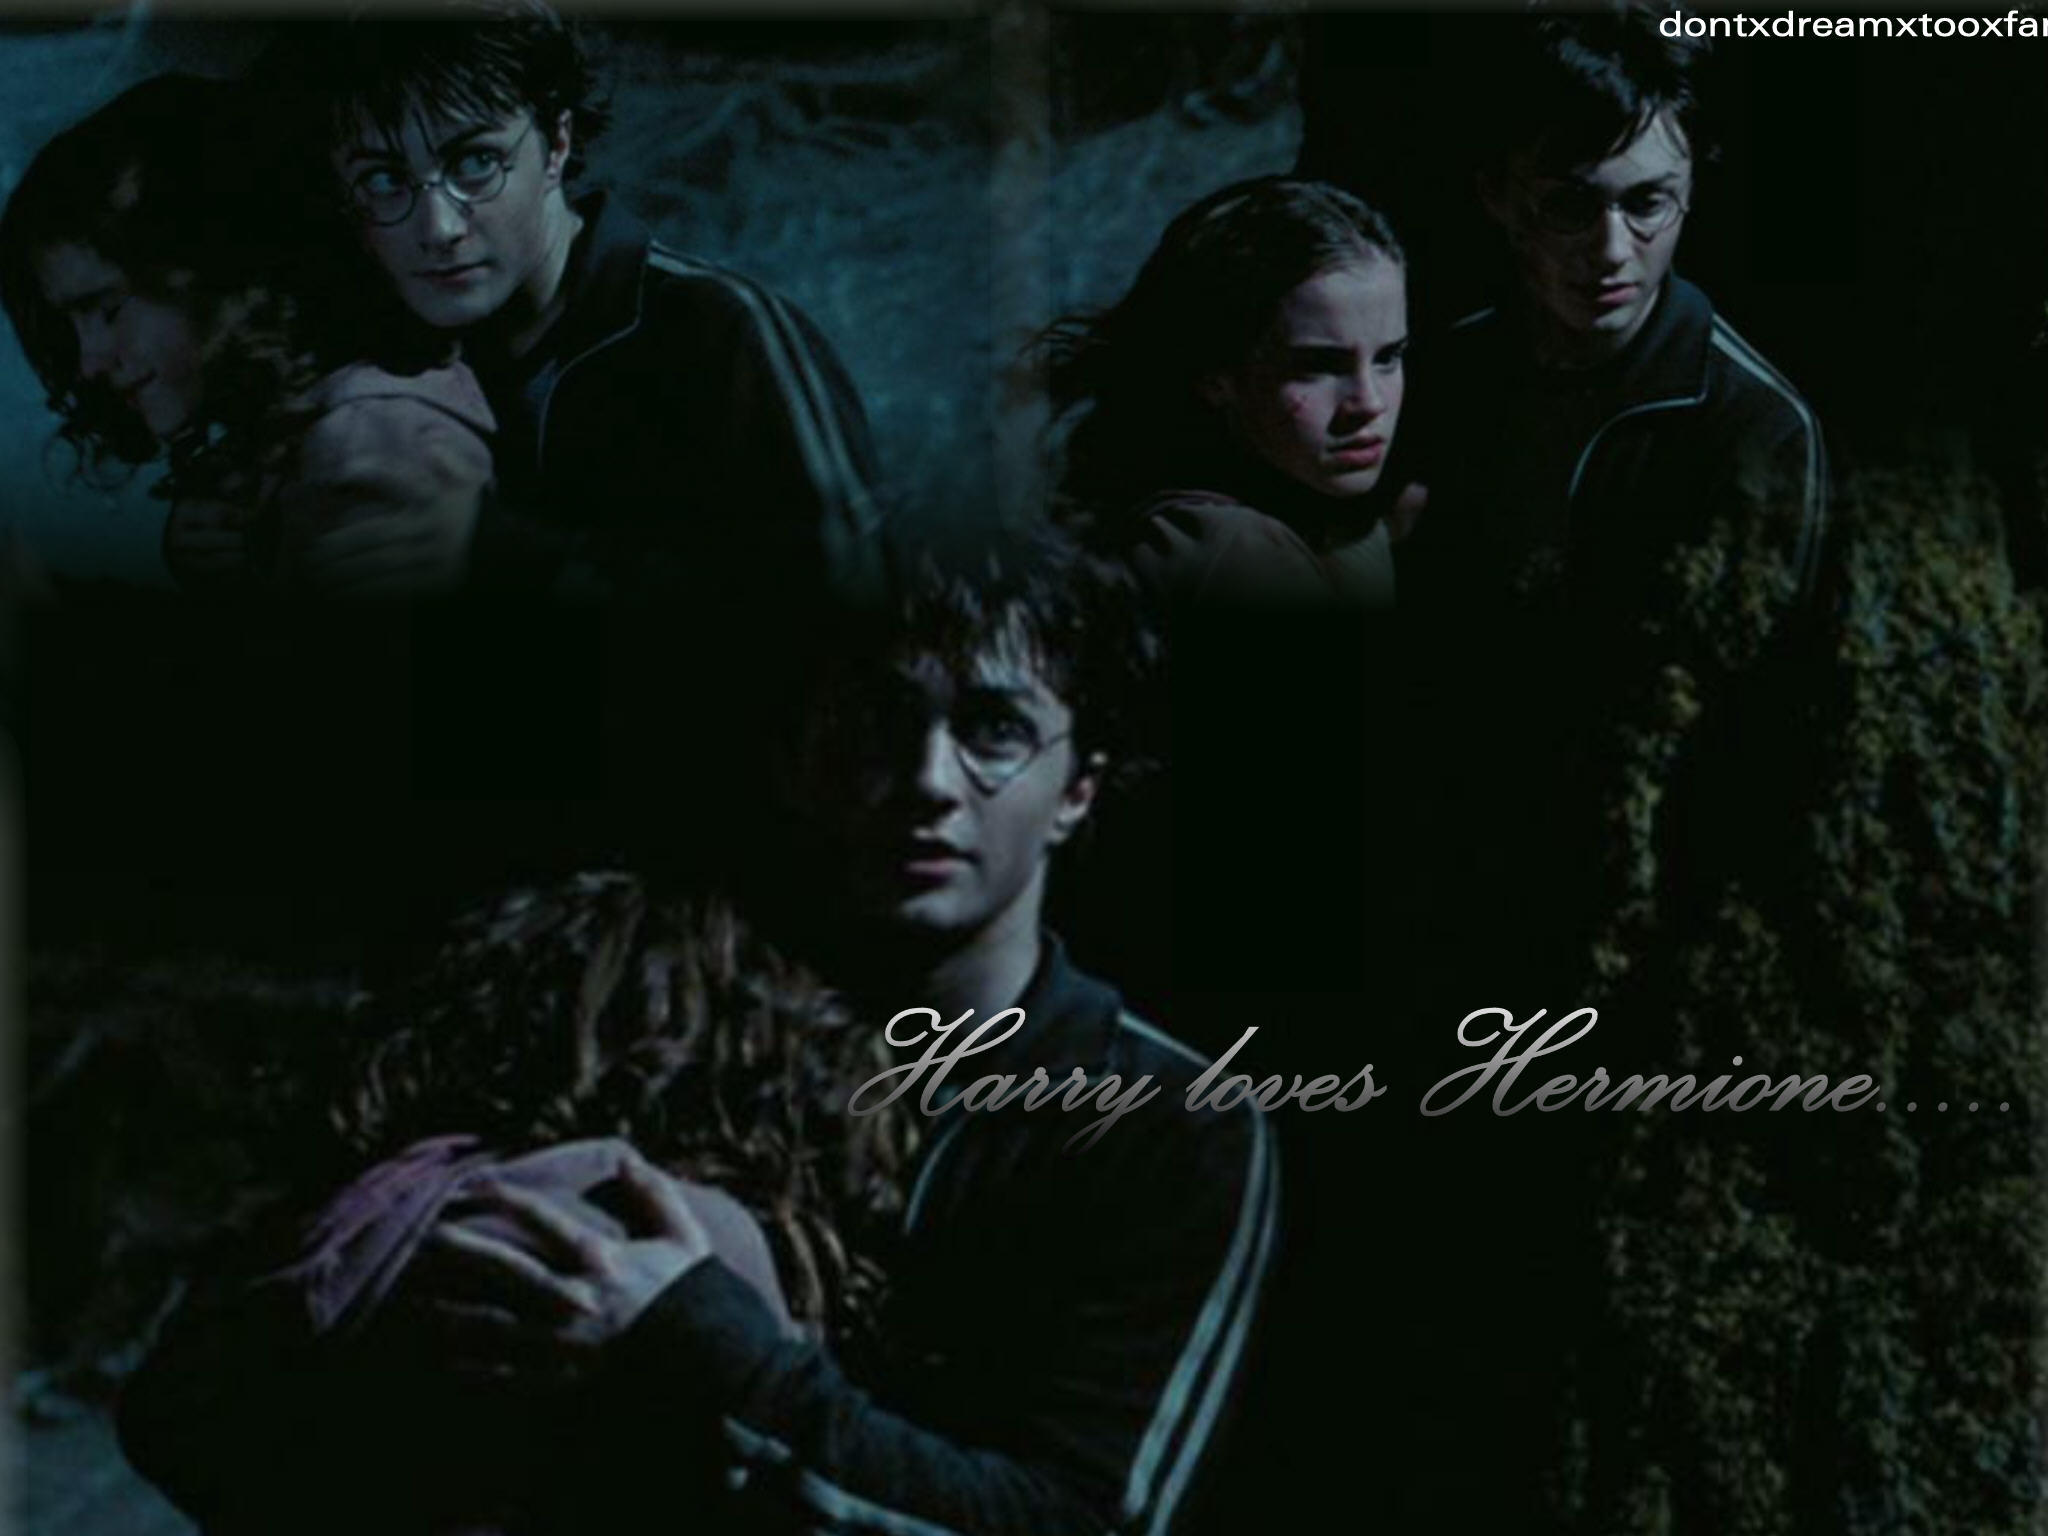 Download Wallpaper Harry Potter Love - harry_loves_hermione_wallpaper_by_dontxdreamxtooxfar  Snapshot_296735.jpg